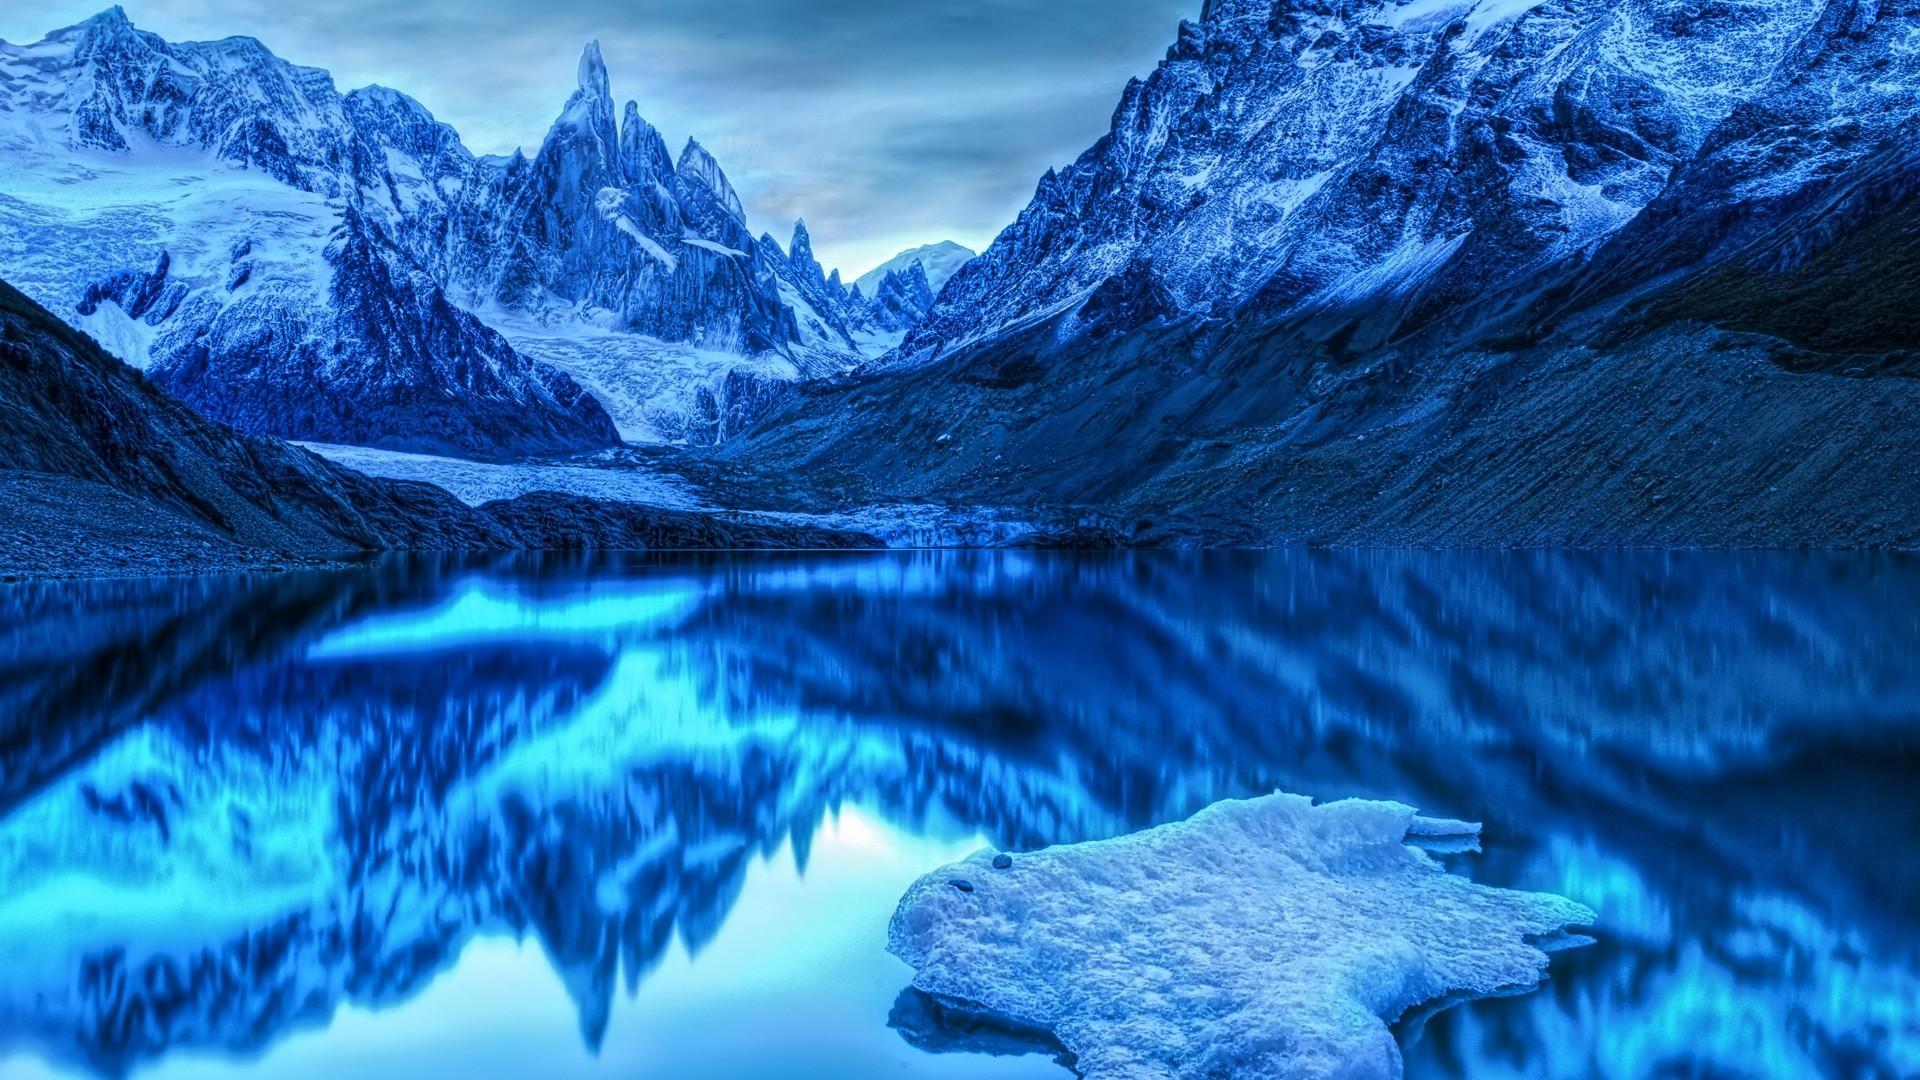 Alaska Wallpapers HD